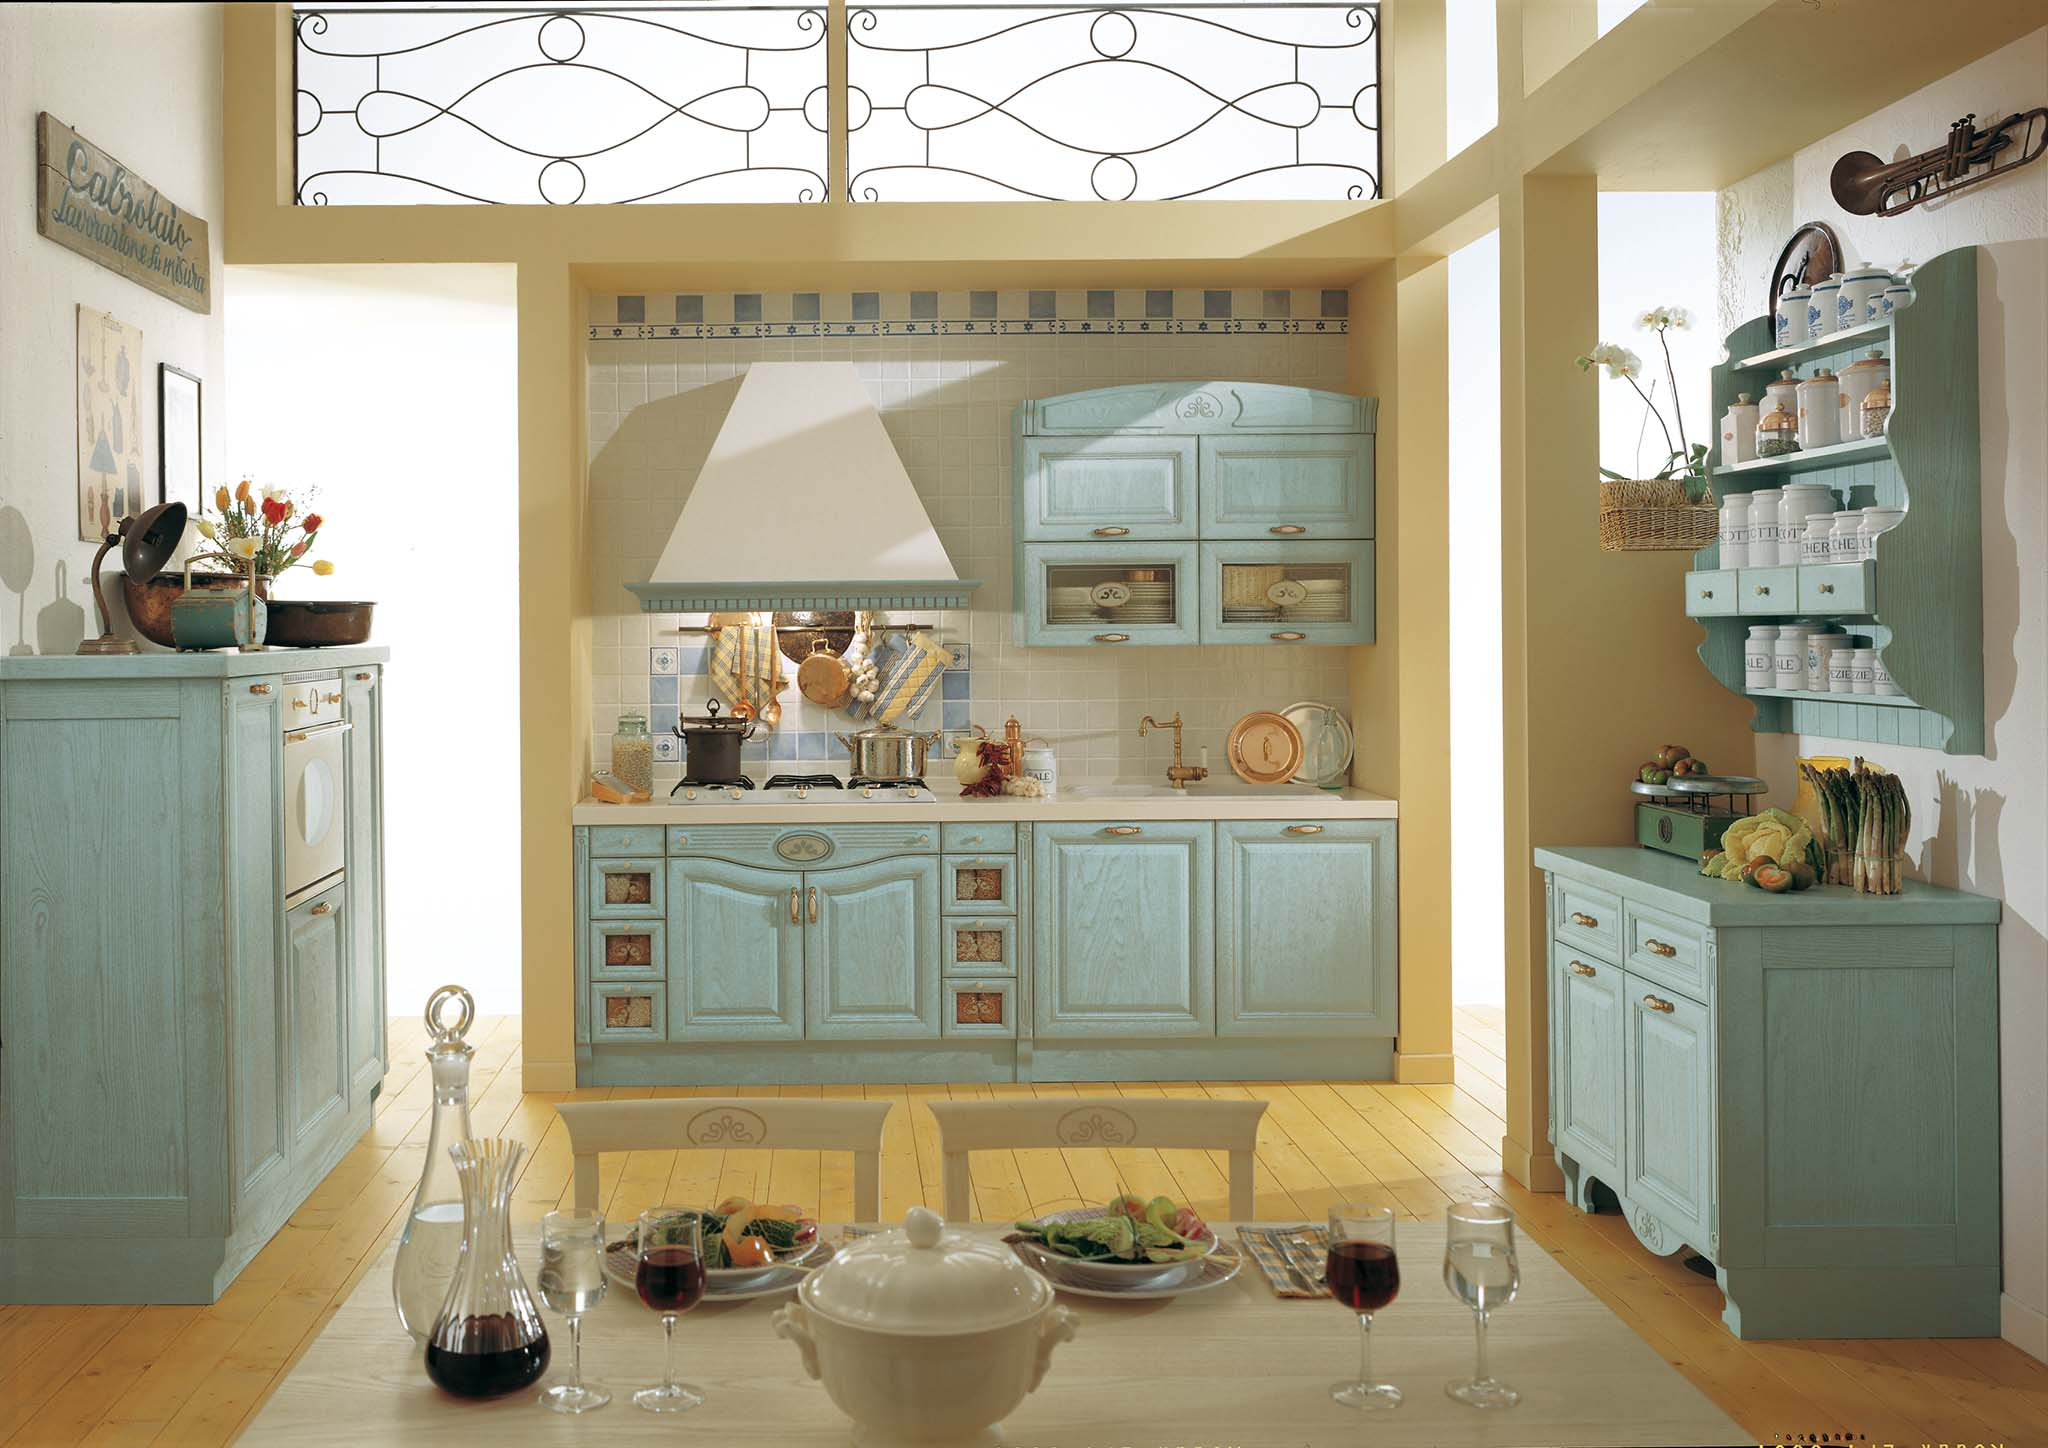 Klasszikus festett türkiz kék konyhabútor